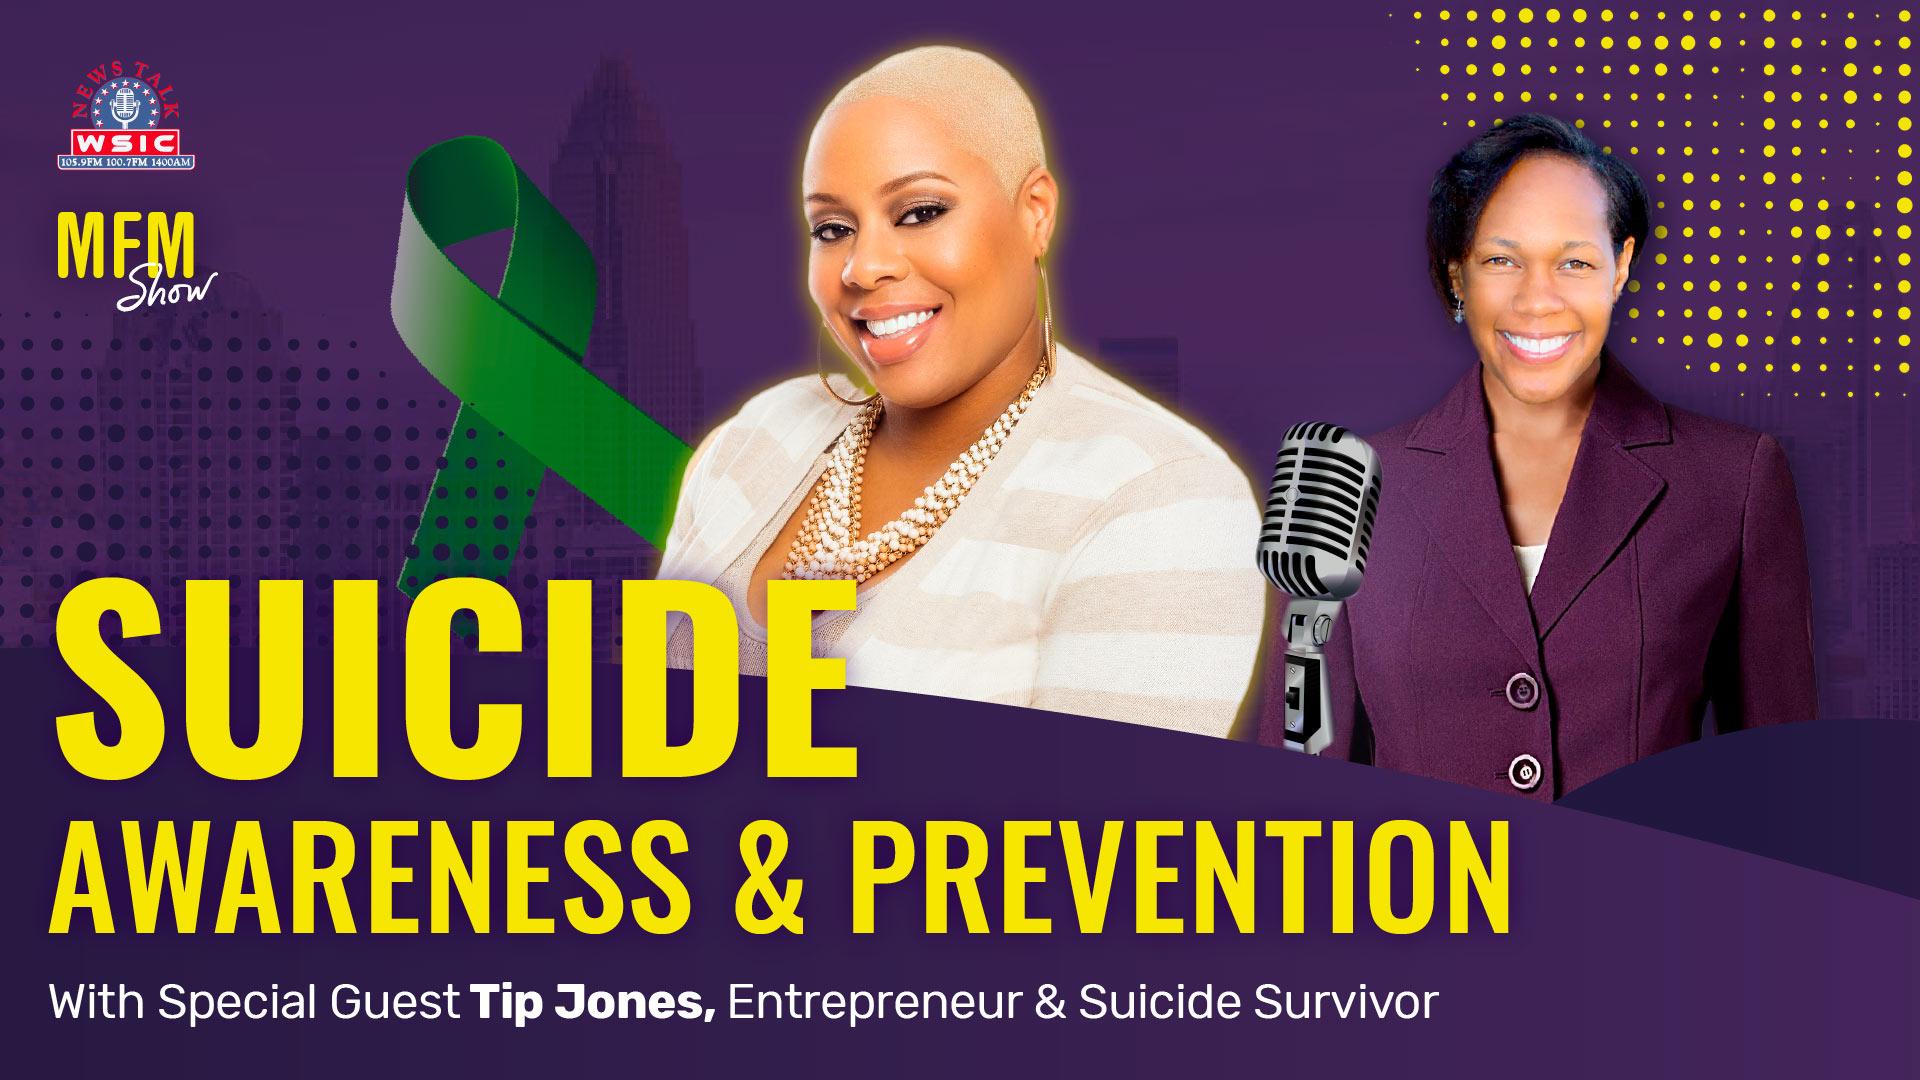 Suicide Prevention & Awareness with Tip Jones